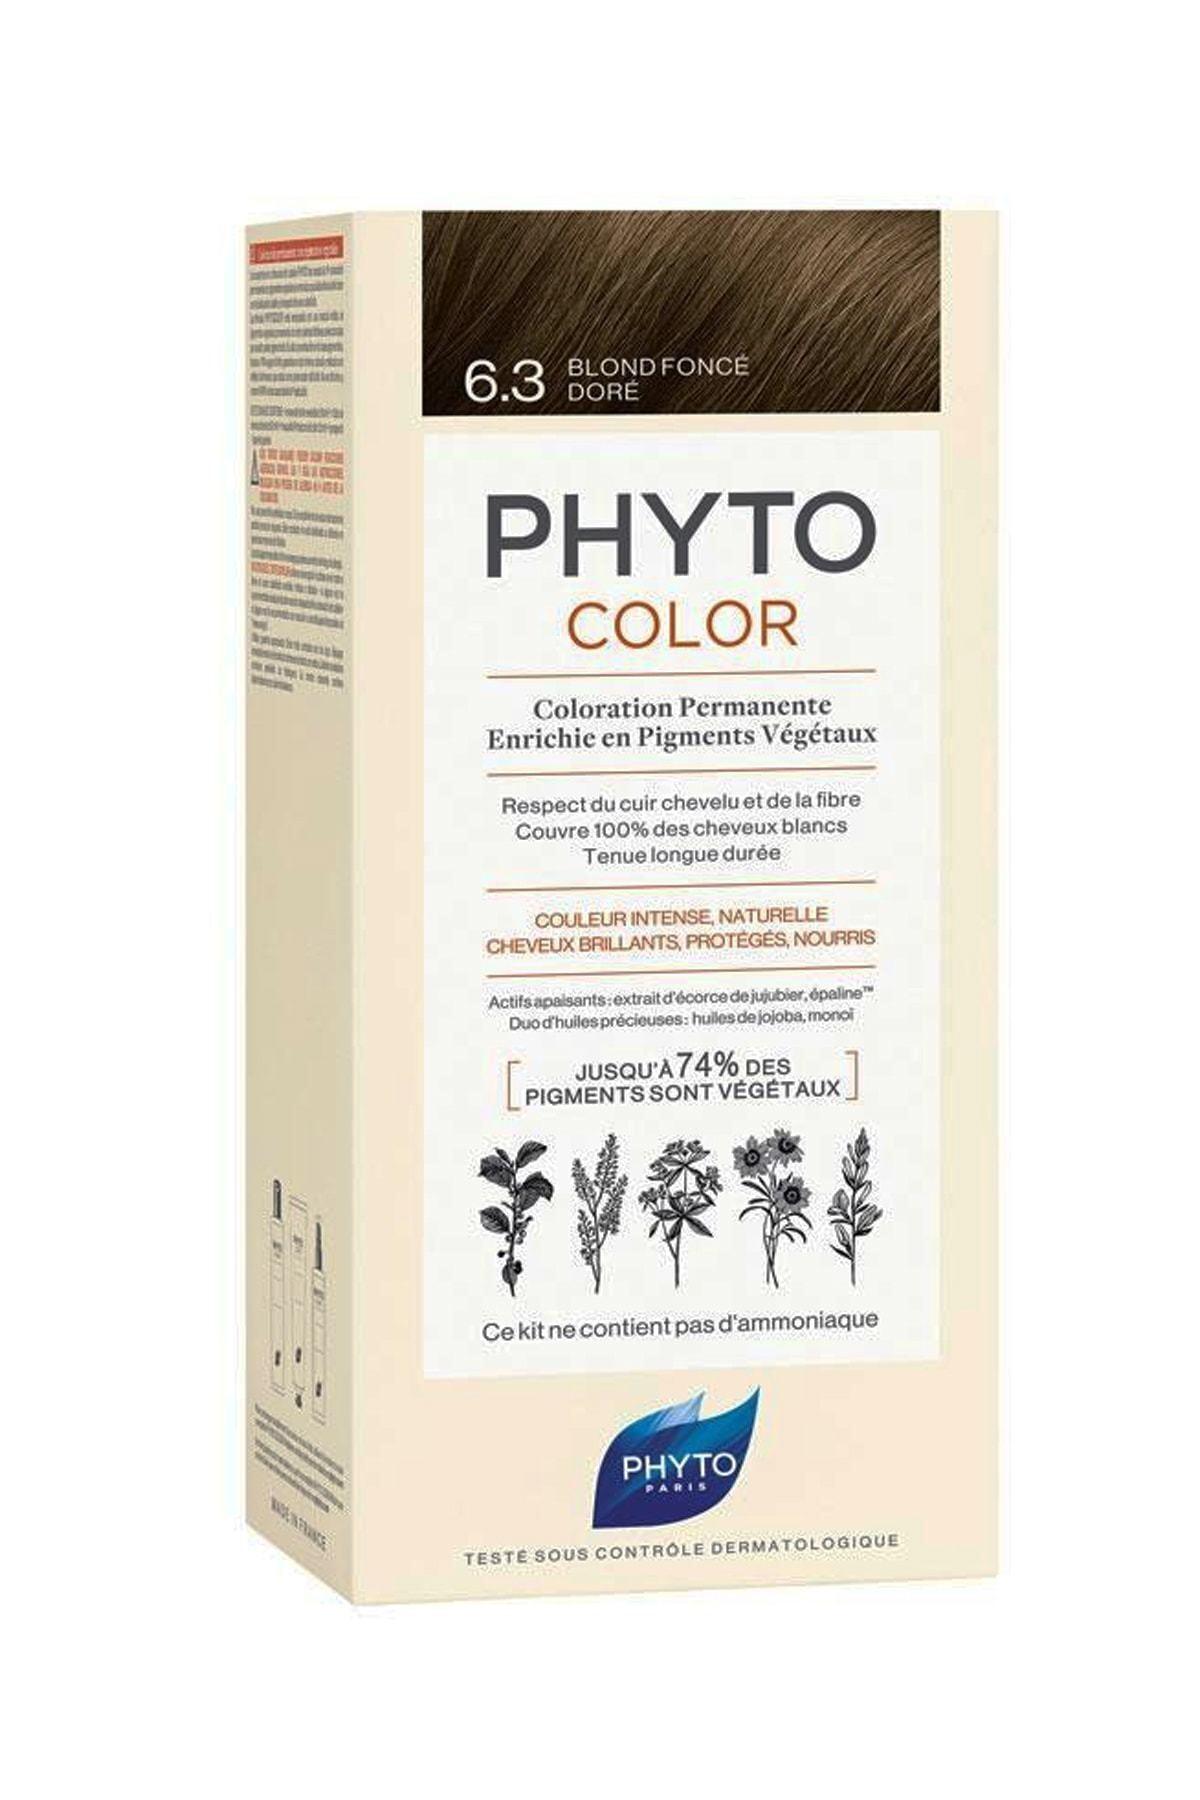 Phyto Color 6.3 - Koyu Kumral Dore 1